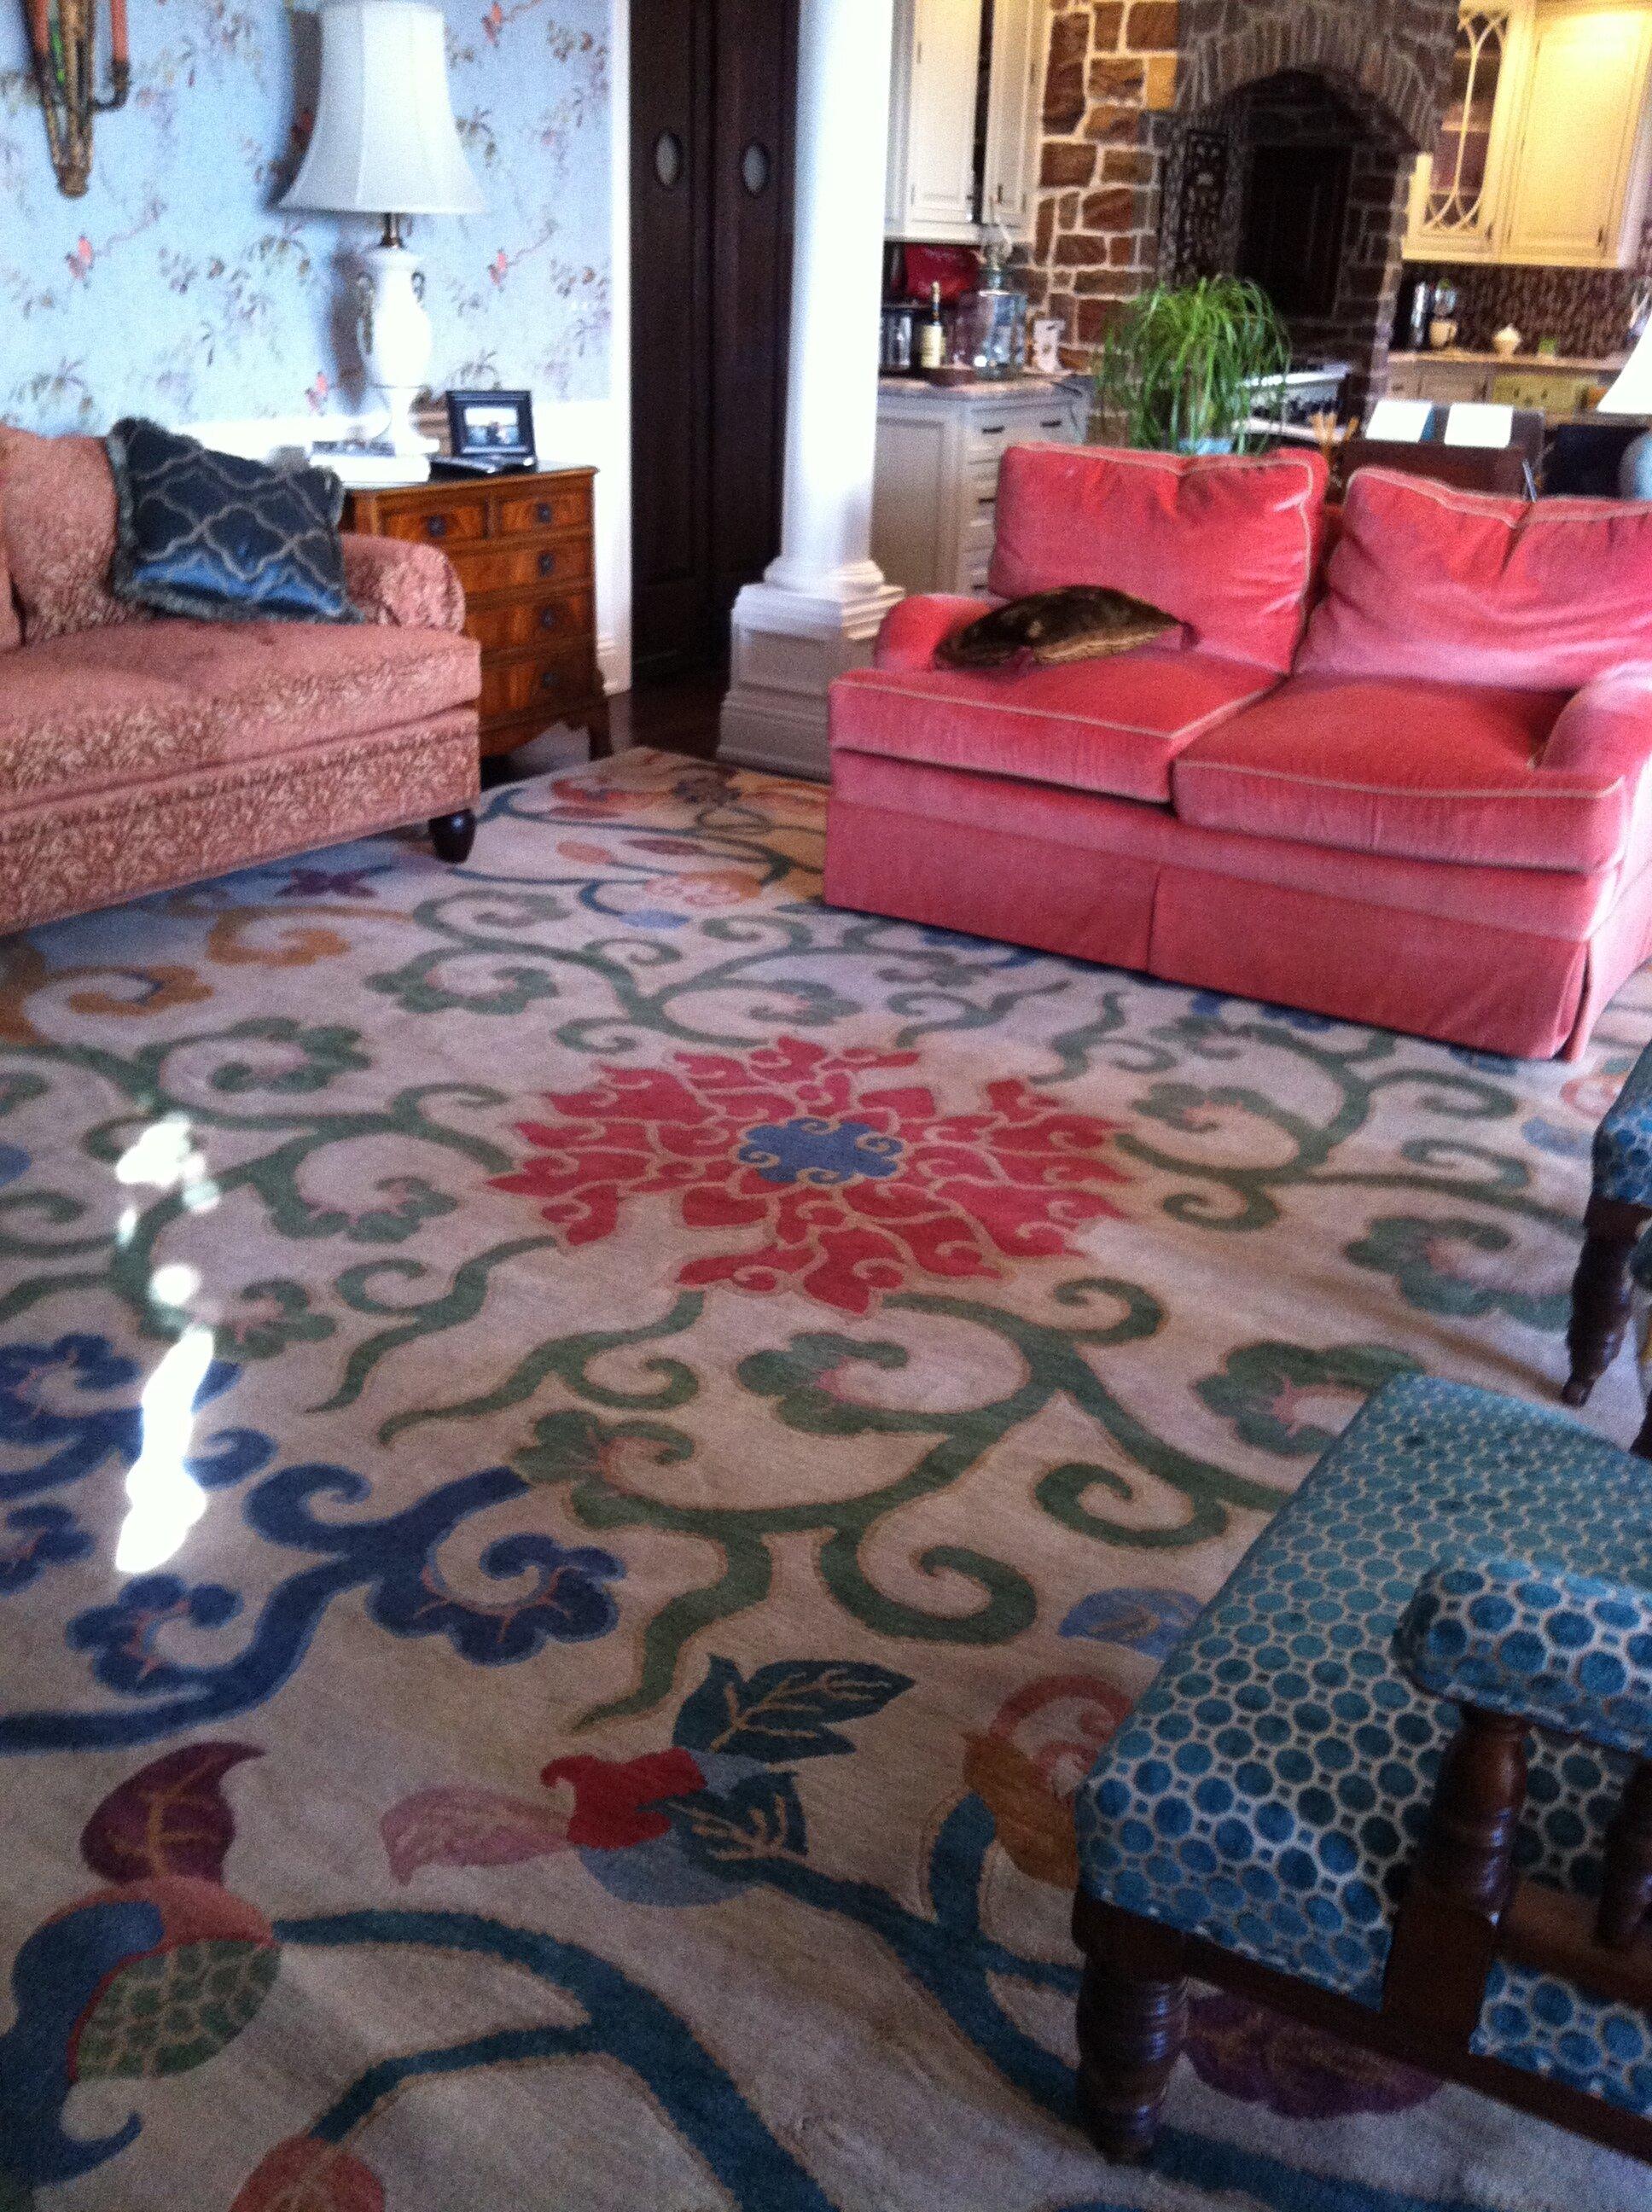 Bespoke carpet, hand woven in Tibet.